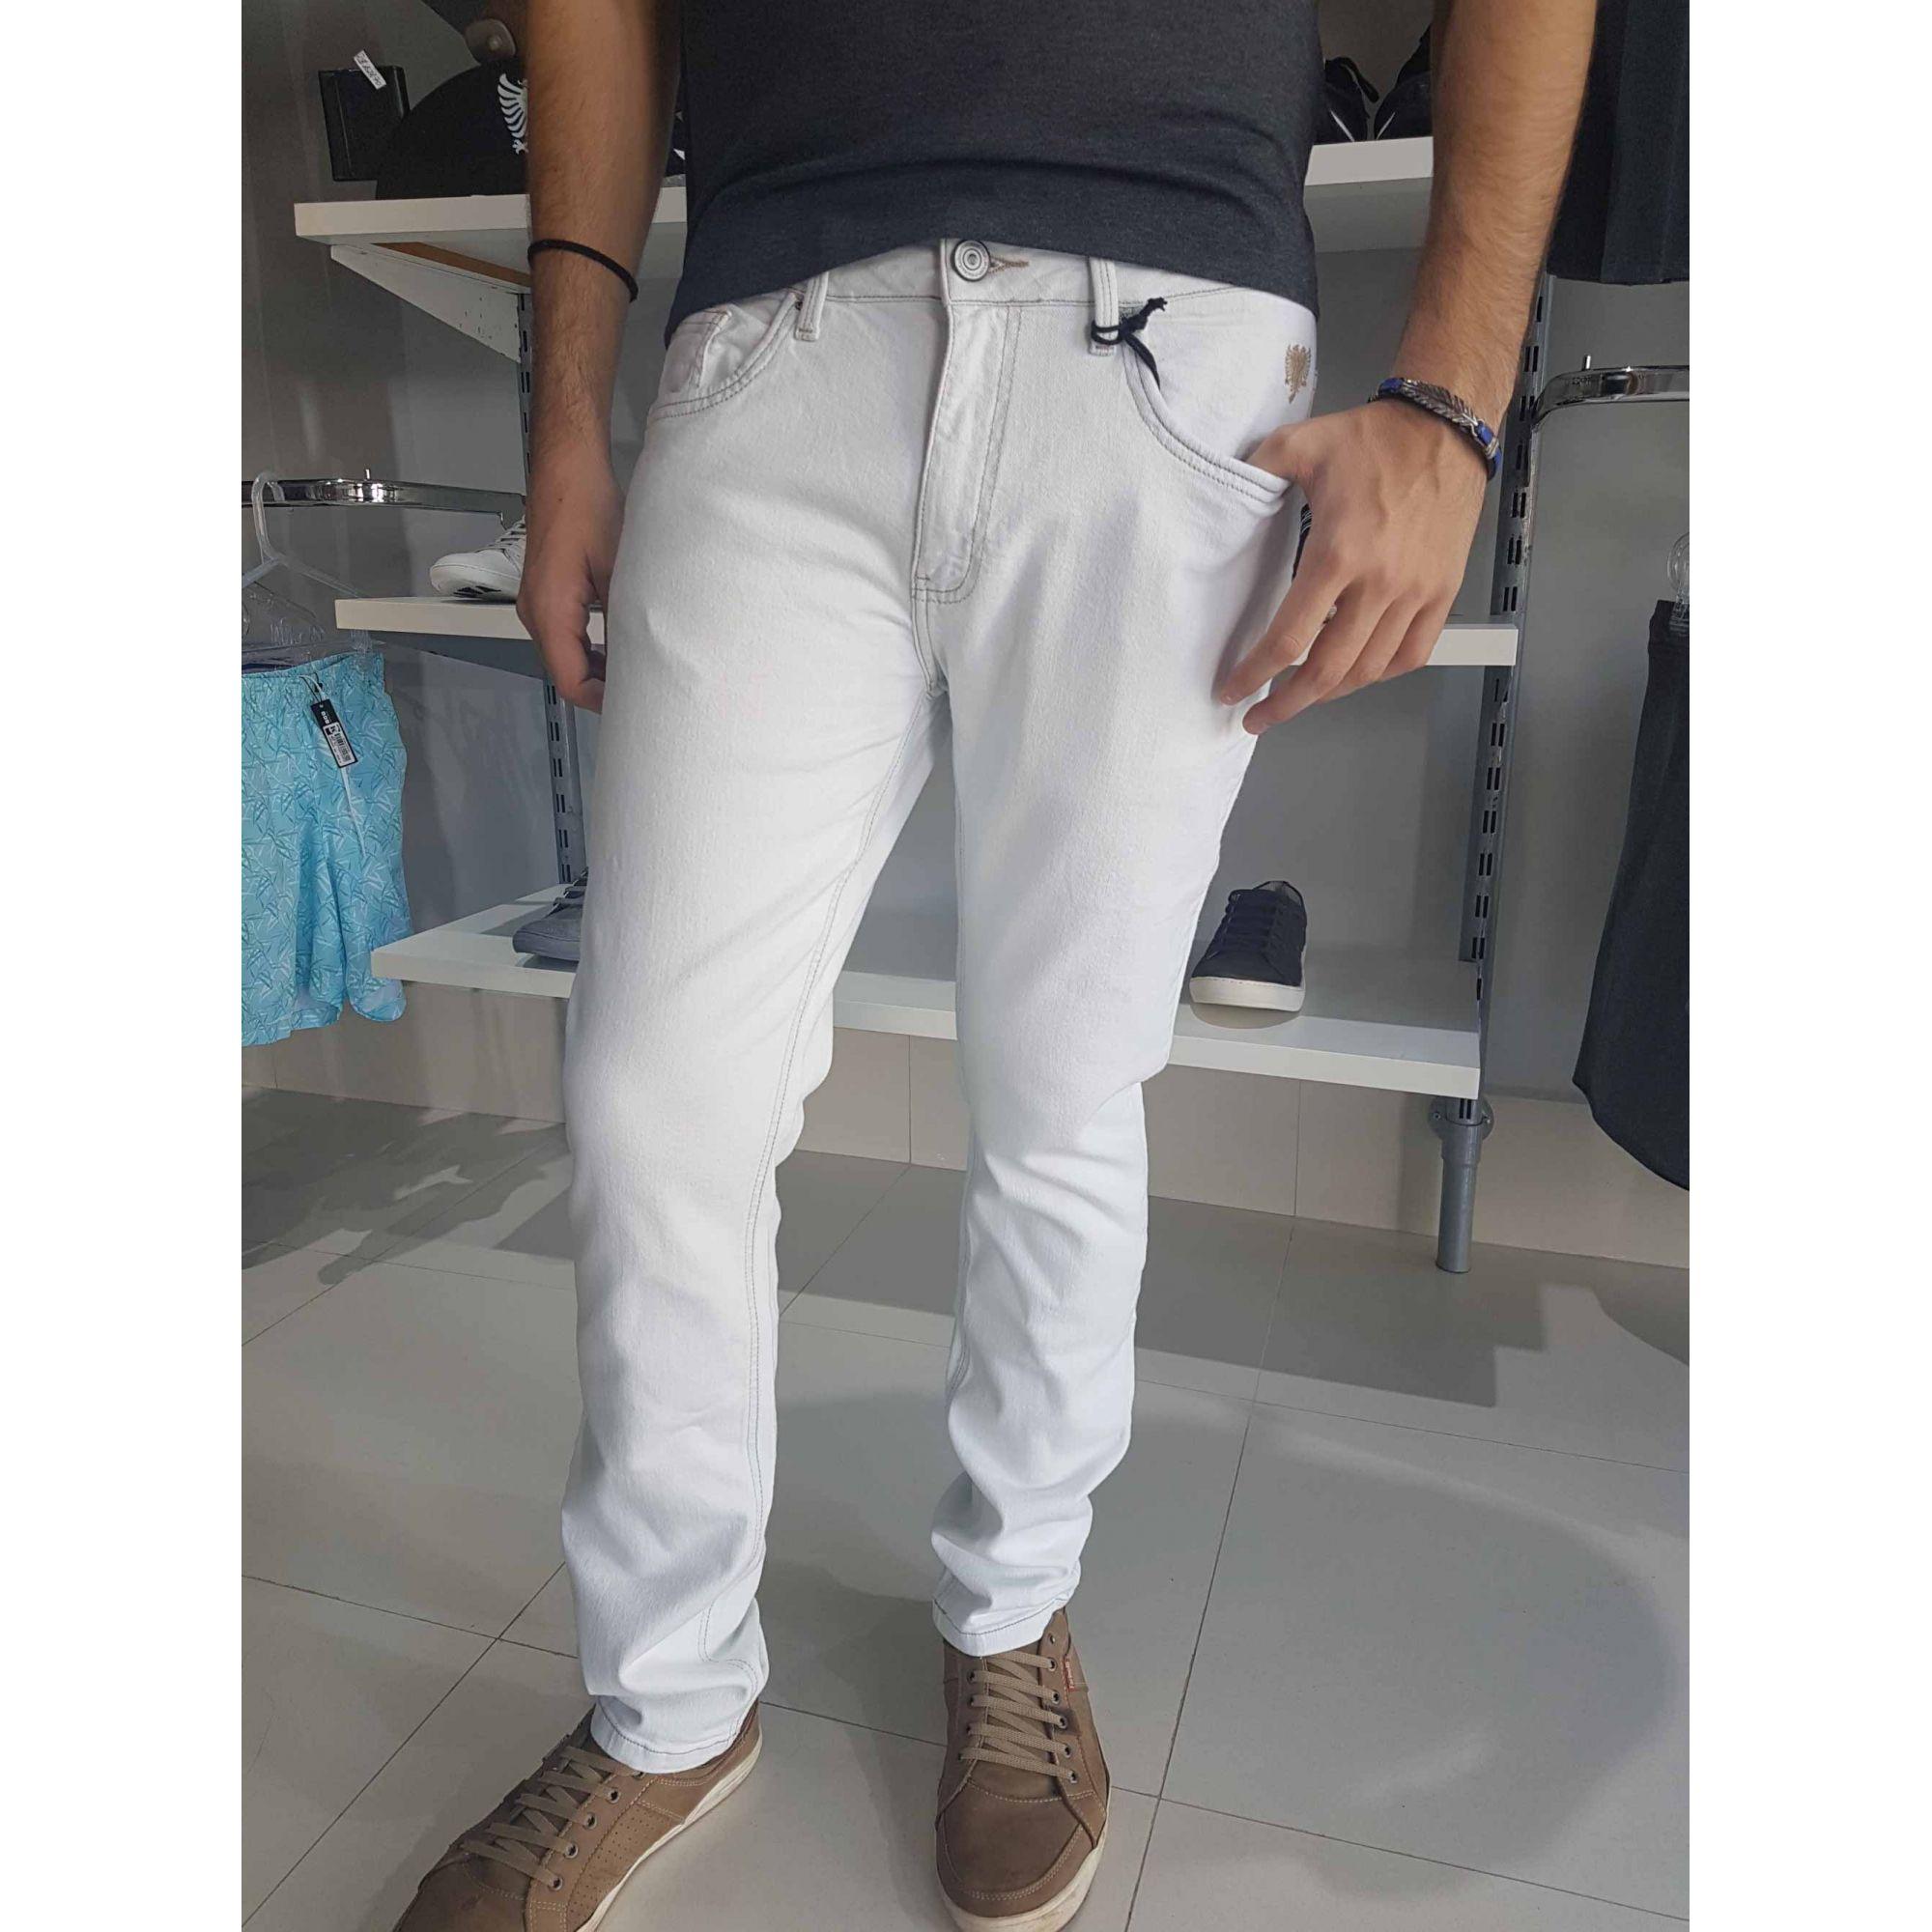 Calça Cavalera Masculina Jeans Branca Reta Super Delave